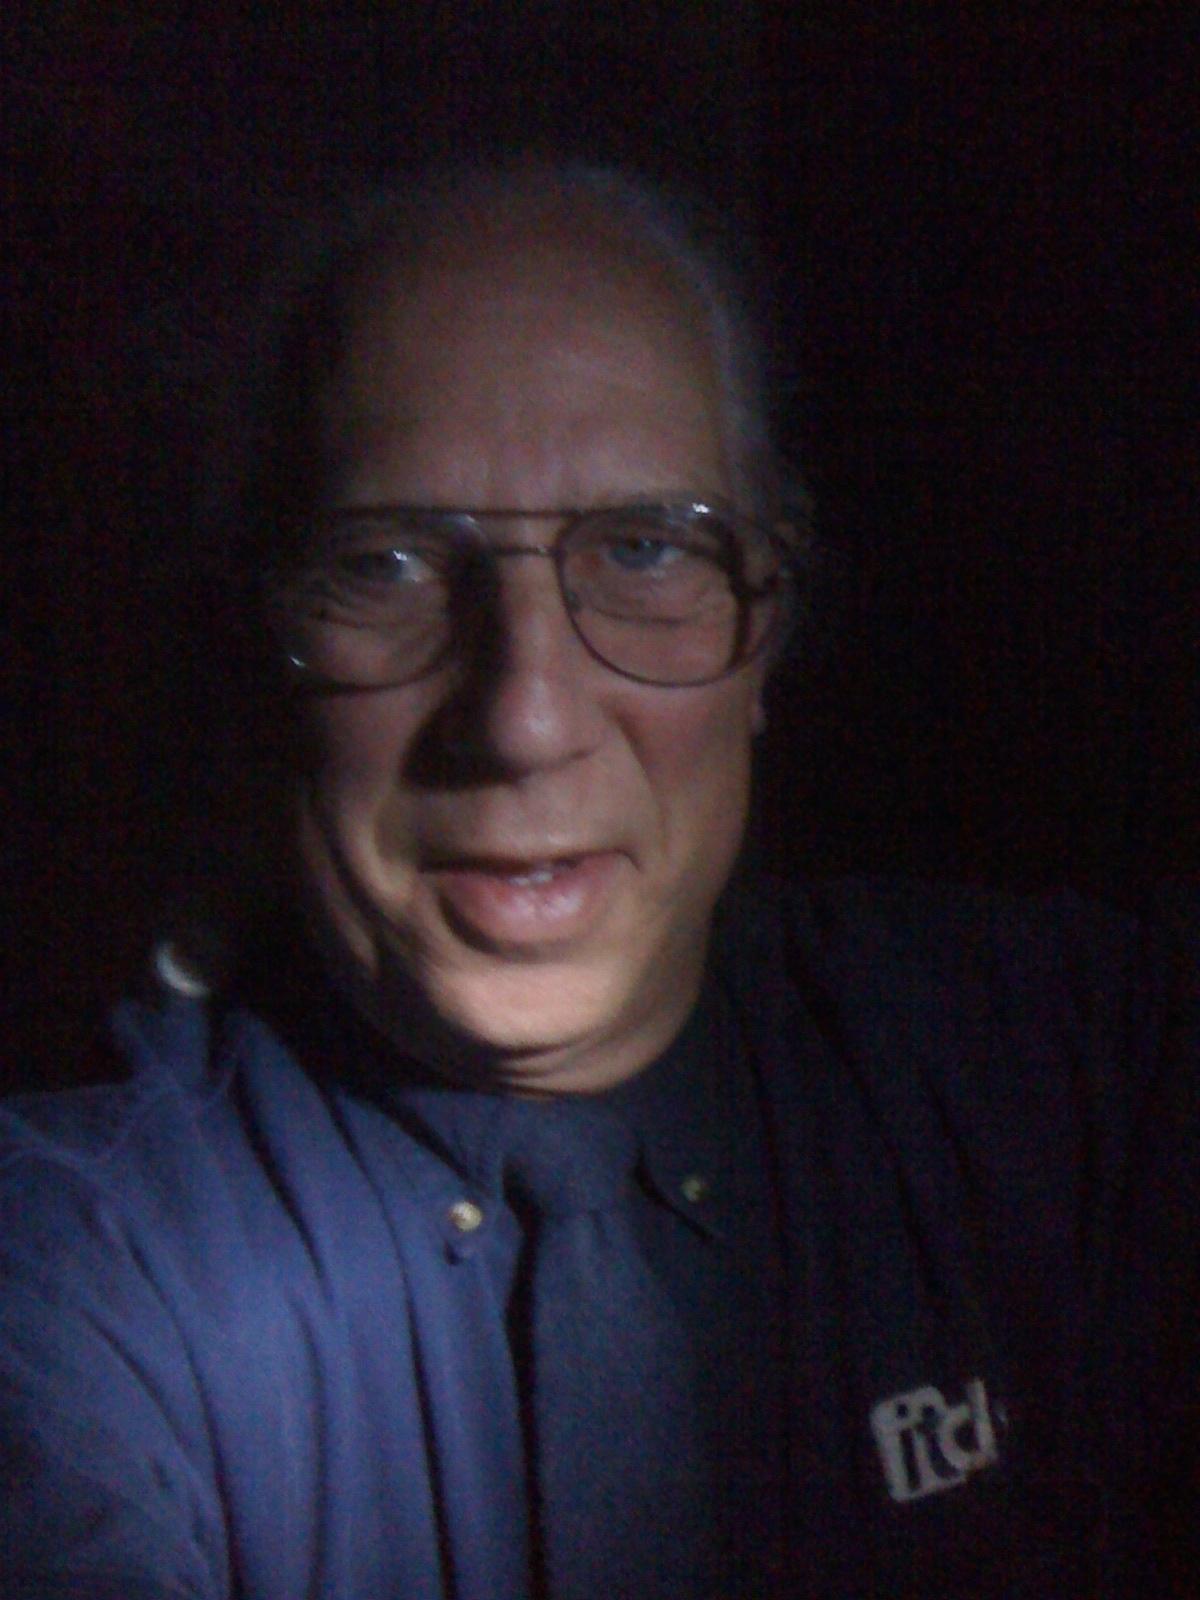 http://1.bp.blogspot.com/_a7m_amqnZD4/S_SjvNQKClI/AAAAAAAABvk/NTBDGiHw5us/s1600/darkdaytie_tie.jpg